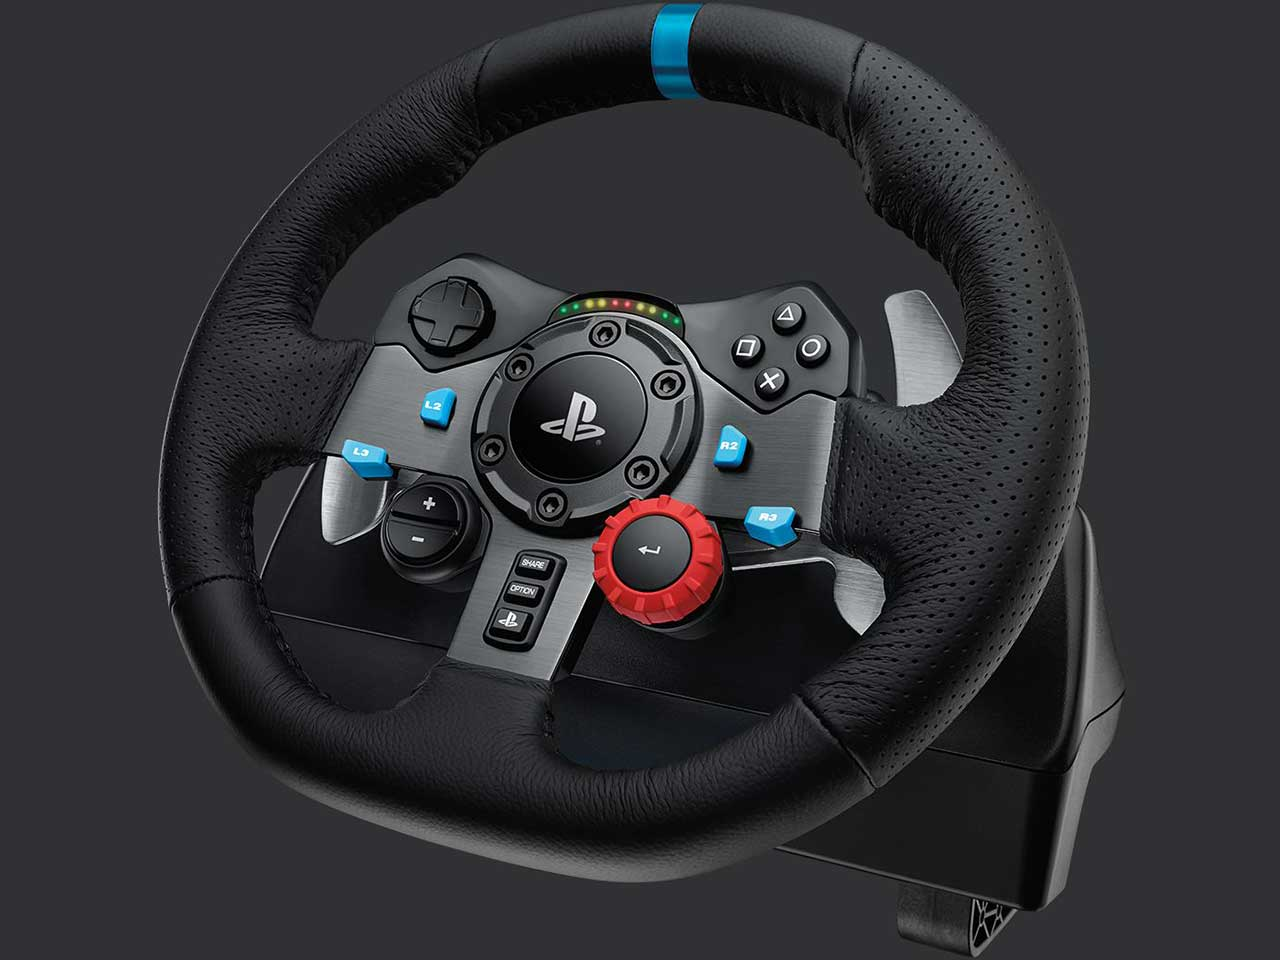 Logitech G29 Driving Force Race Wheel 07 1 - فرمان بازی لاجیتک مدل G29 Driving Force مخصوص PS4/PC